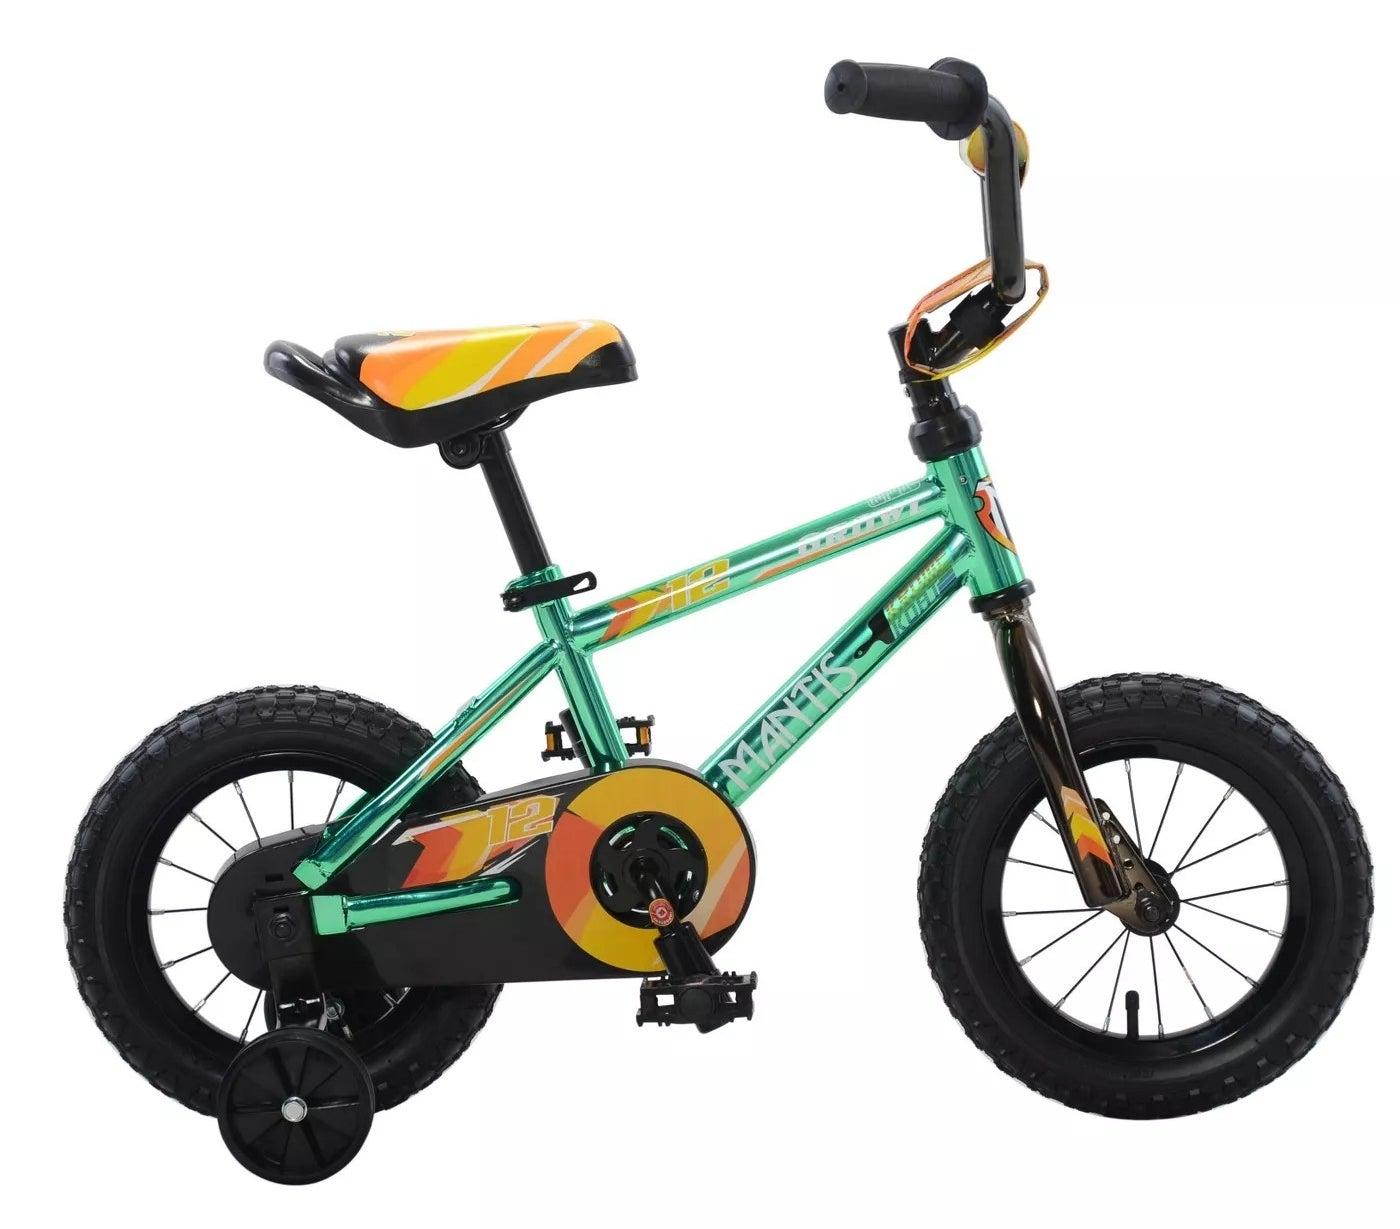 The green, orange, and yellow Mantis kids bike with training wheels